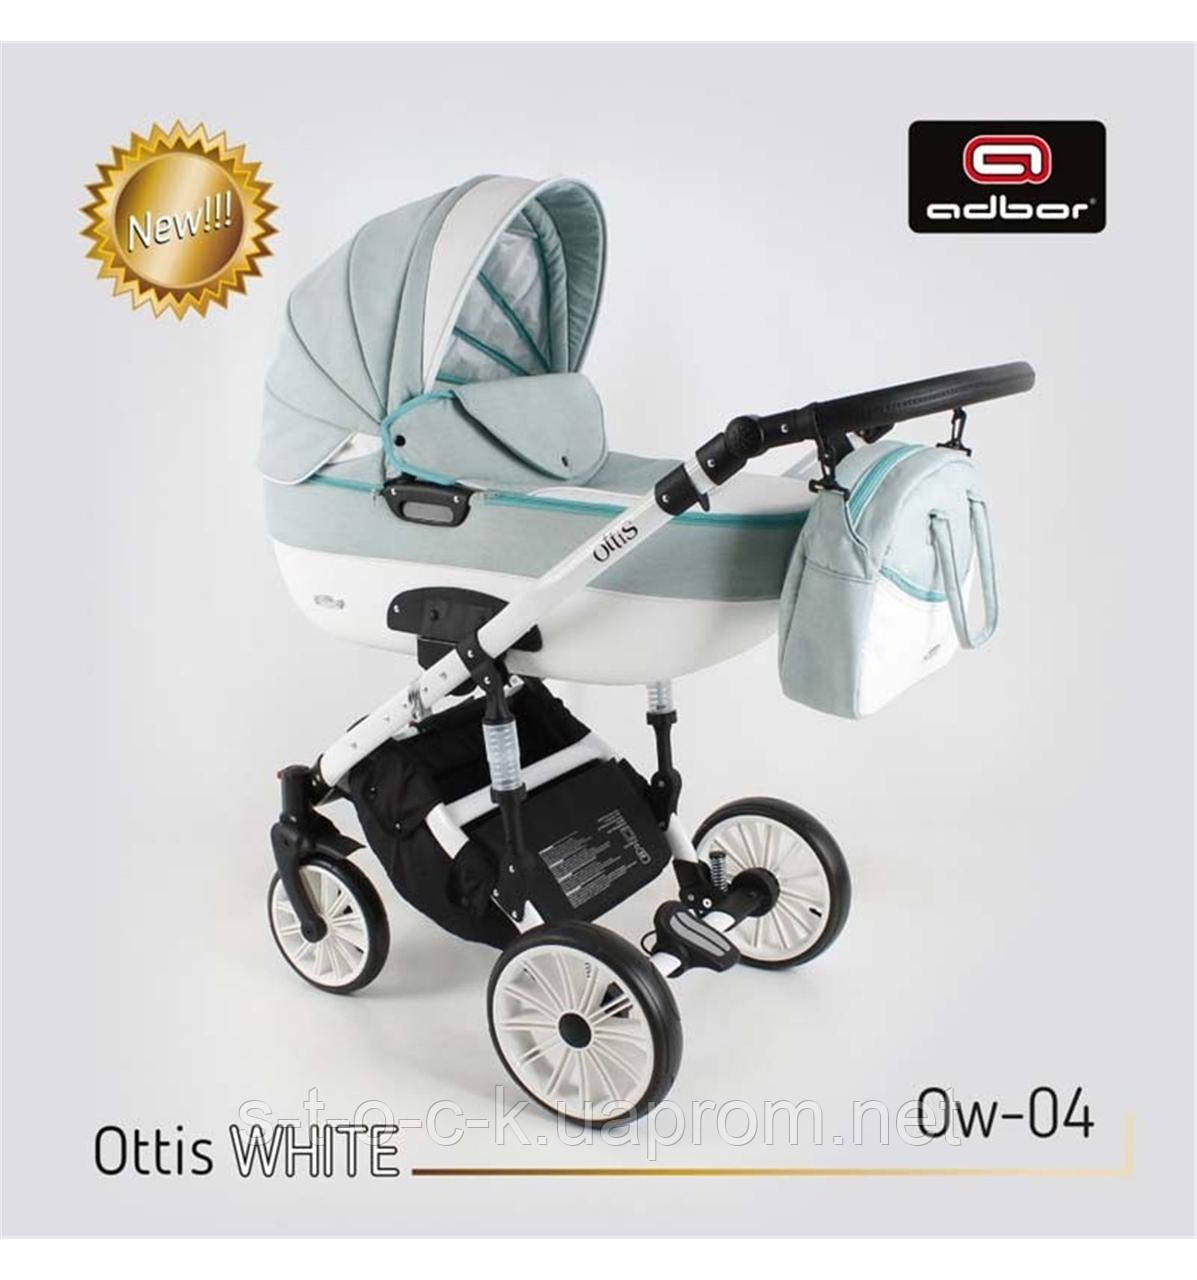 Дитяча універсальна коляска Adbor OTTIS 2 в1.WHITE OW-04